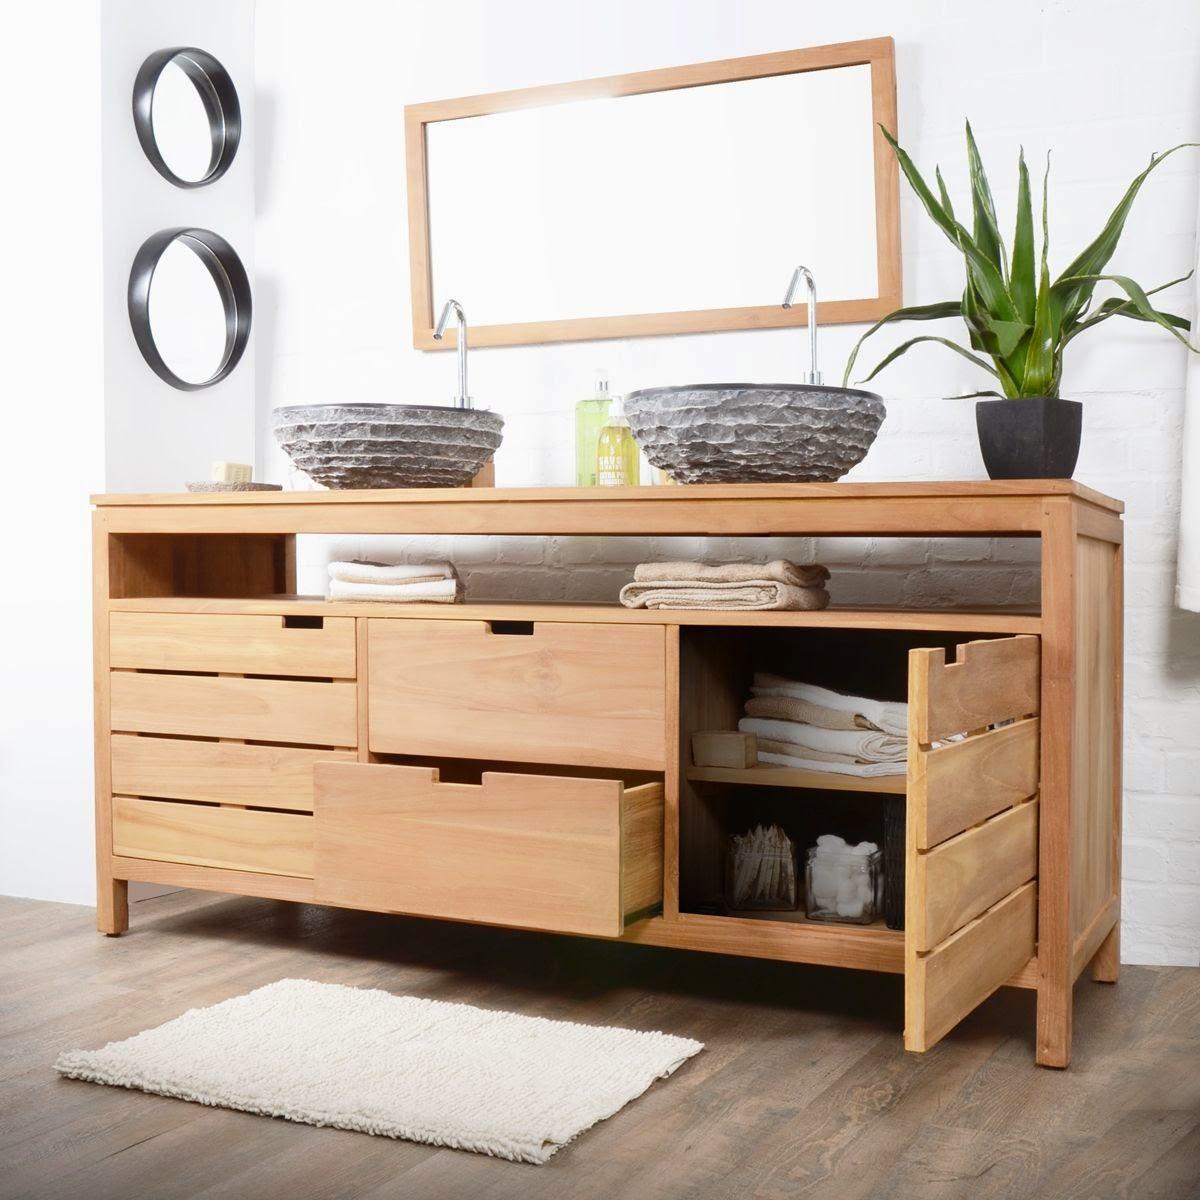 Meuble salle de bain bois 2 vasques meuble d coration maison for Meuble de vasque salle de bain